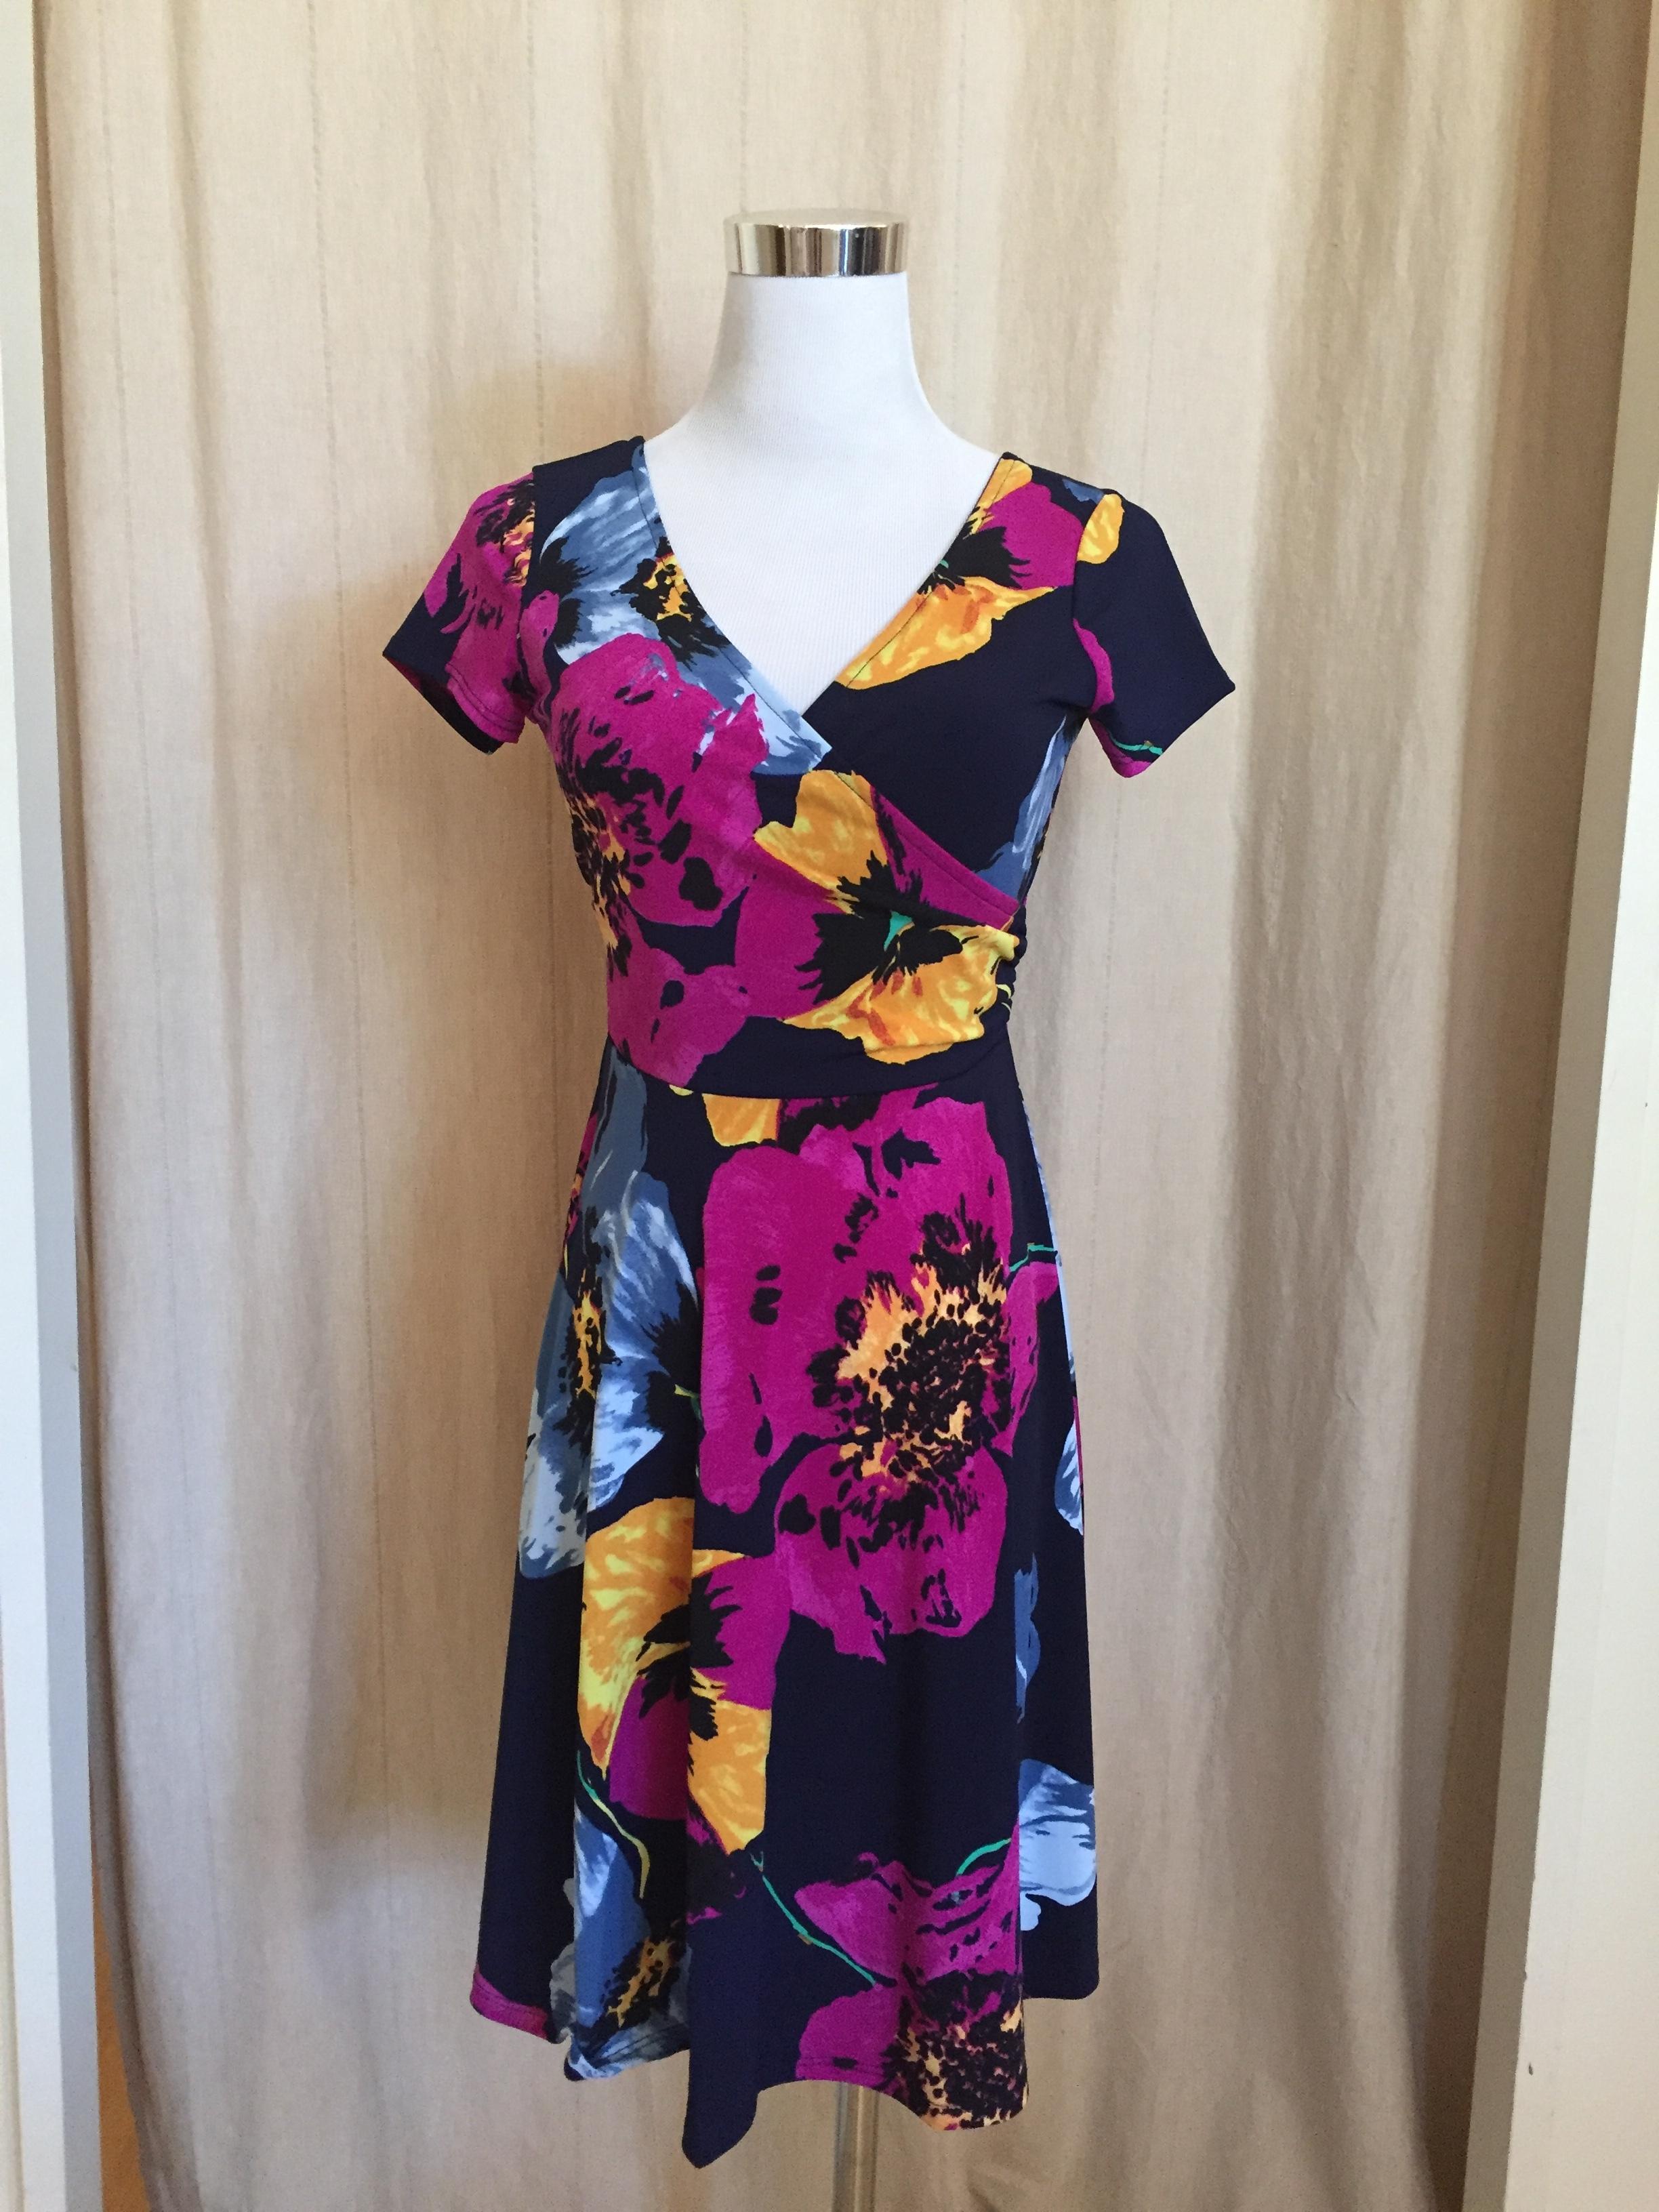 Pop of Floral Cross Front Dress, $42